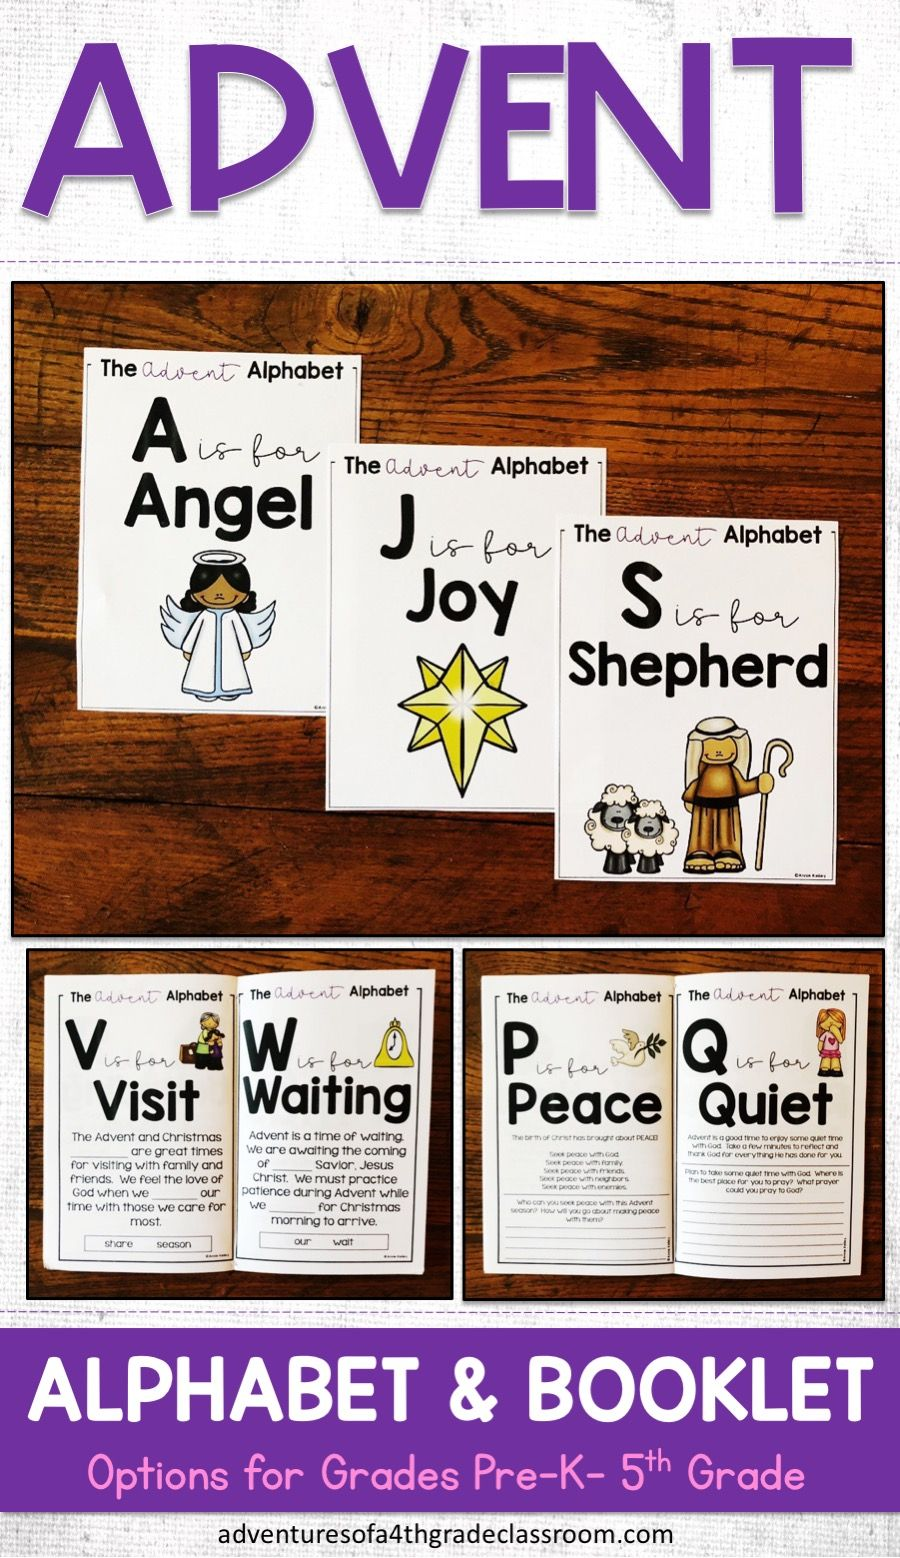 medium resolution of Advent Alphabet \u0026 Booklet   Elementary social studies lessons